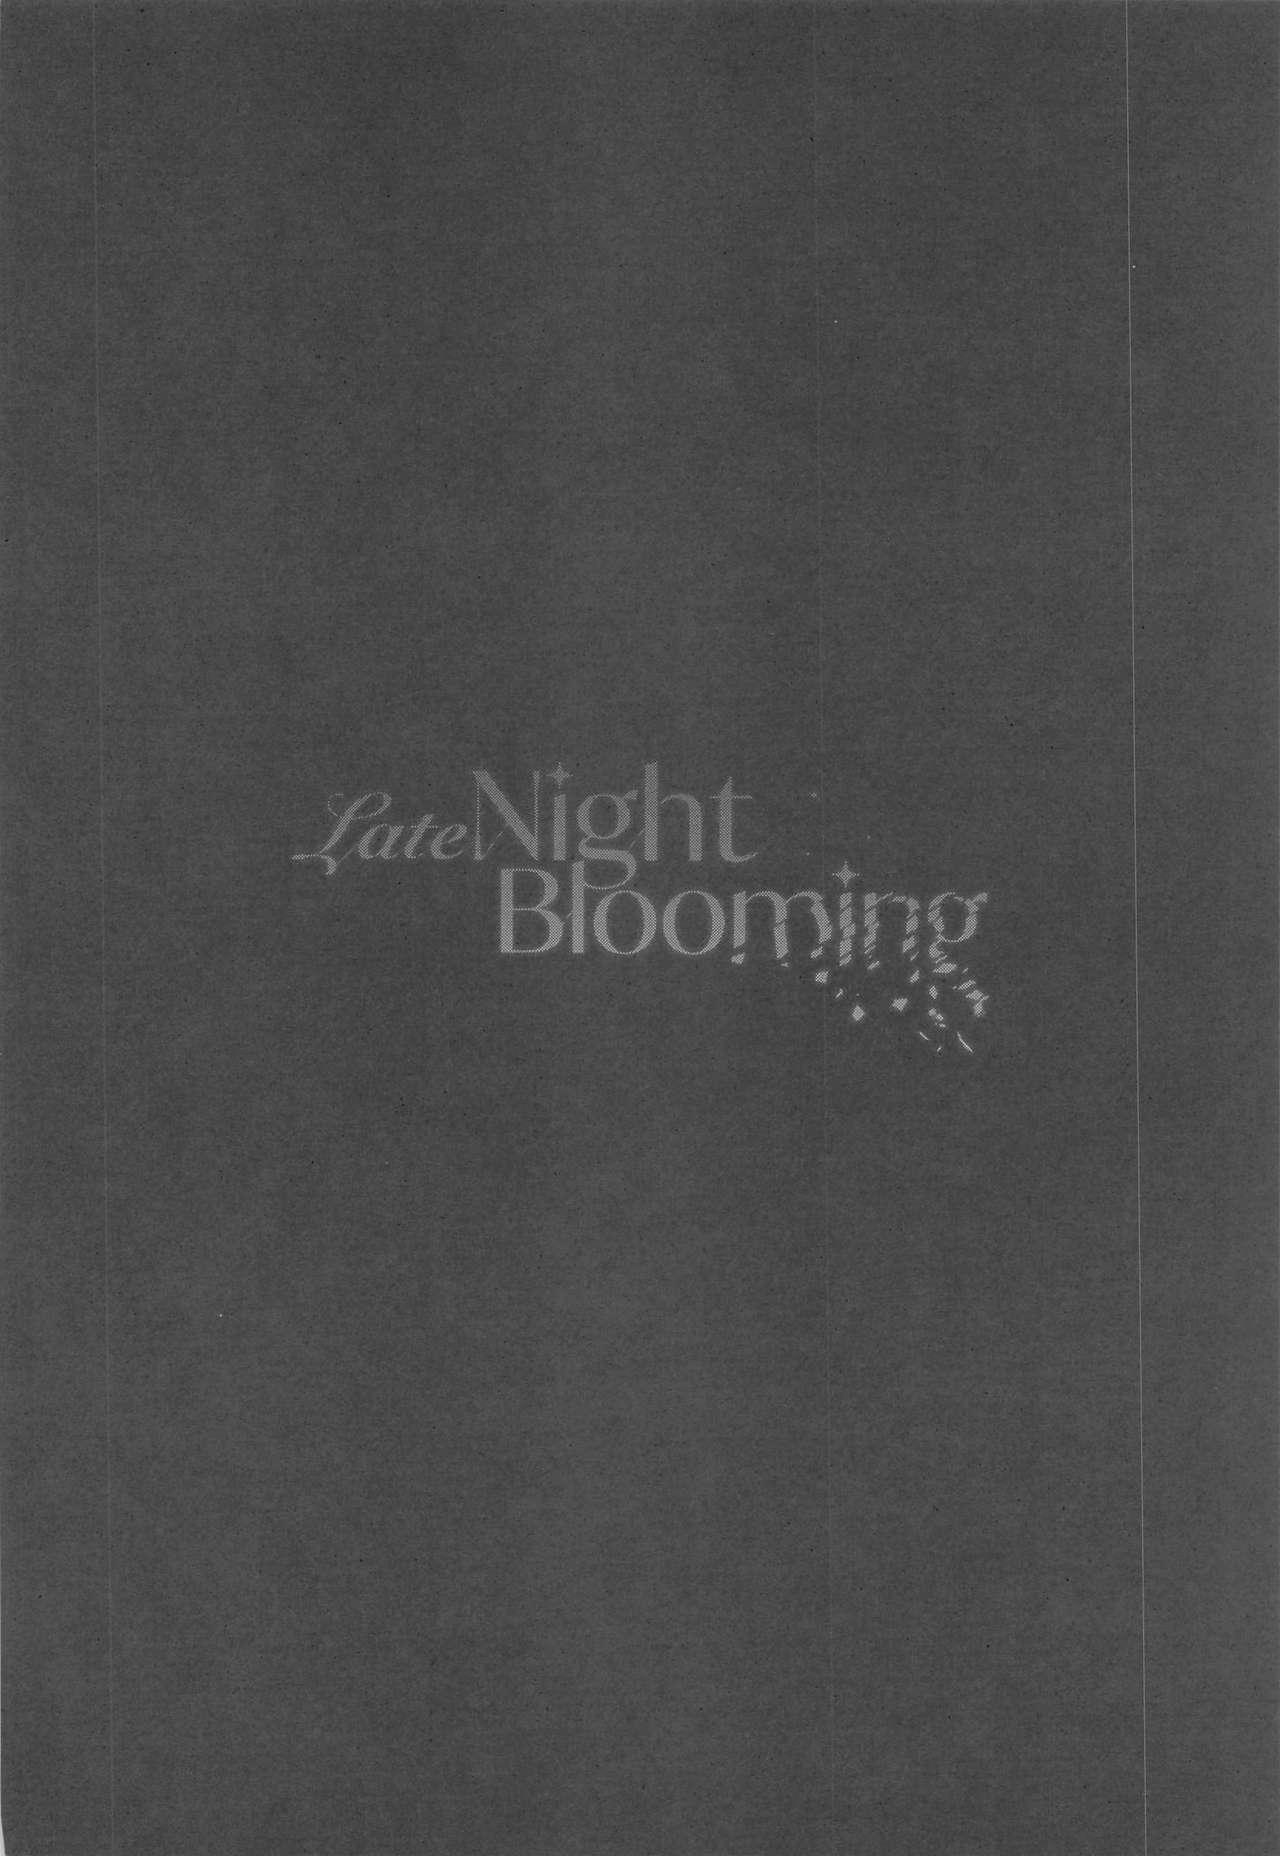 Late Night Blooming 39